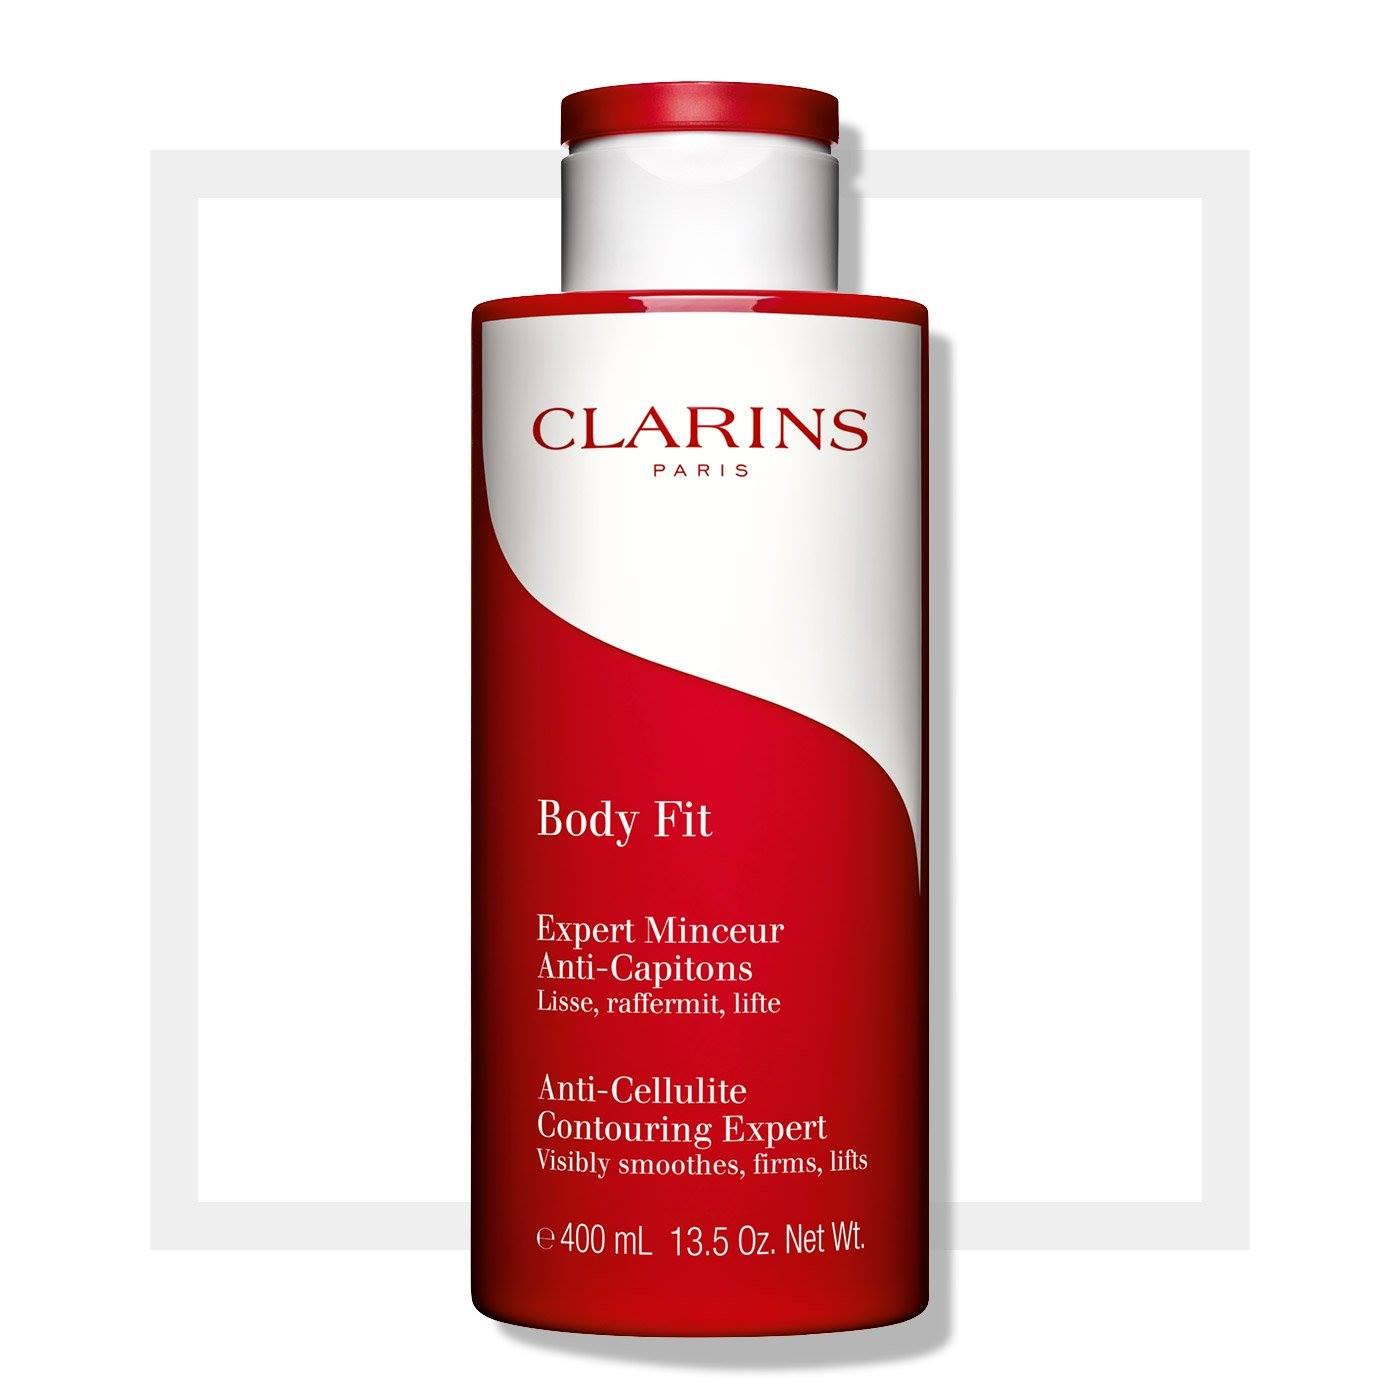 Body Fit Crema Anti cellulite CLARINS